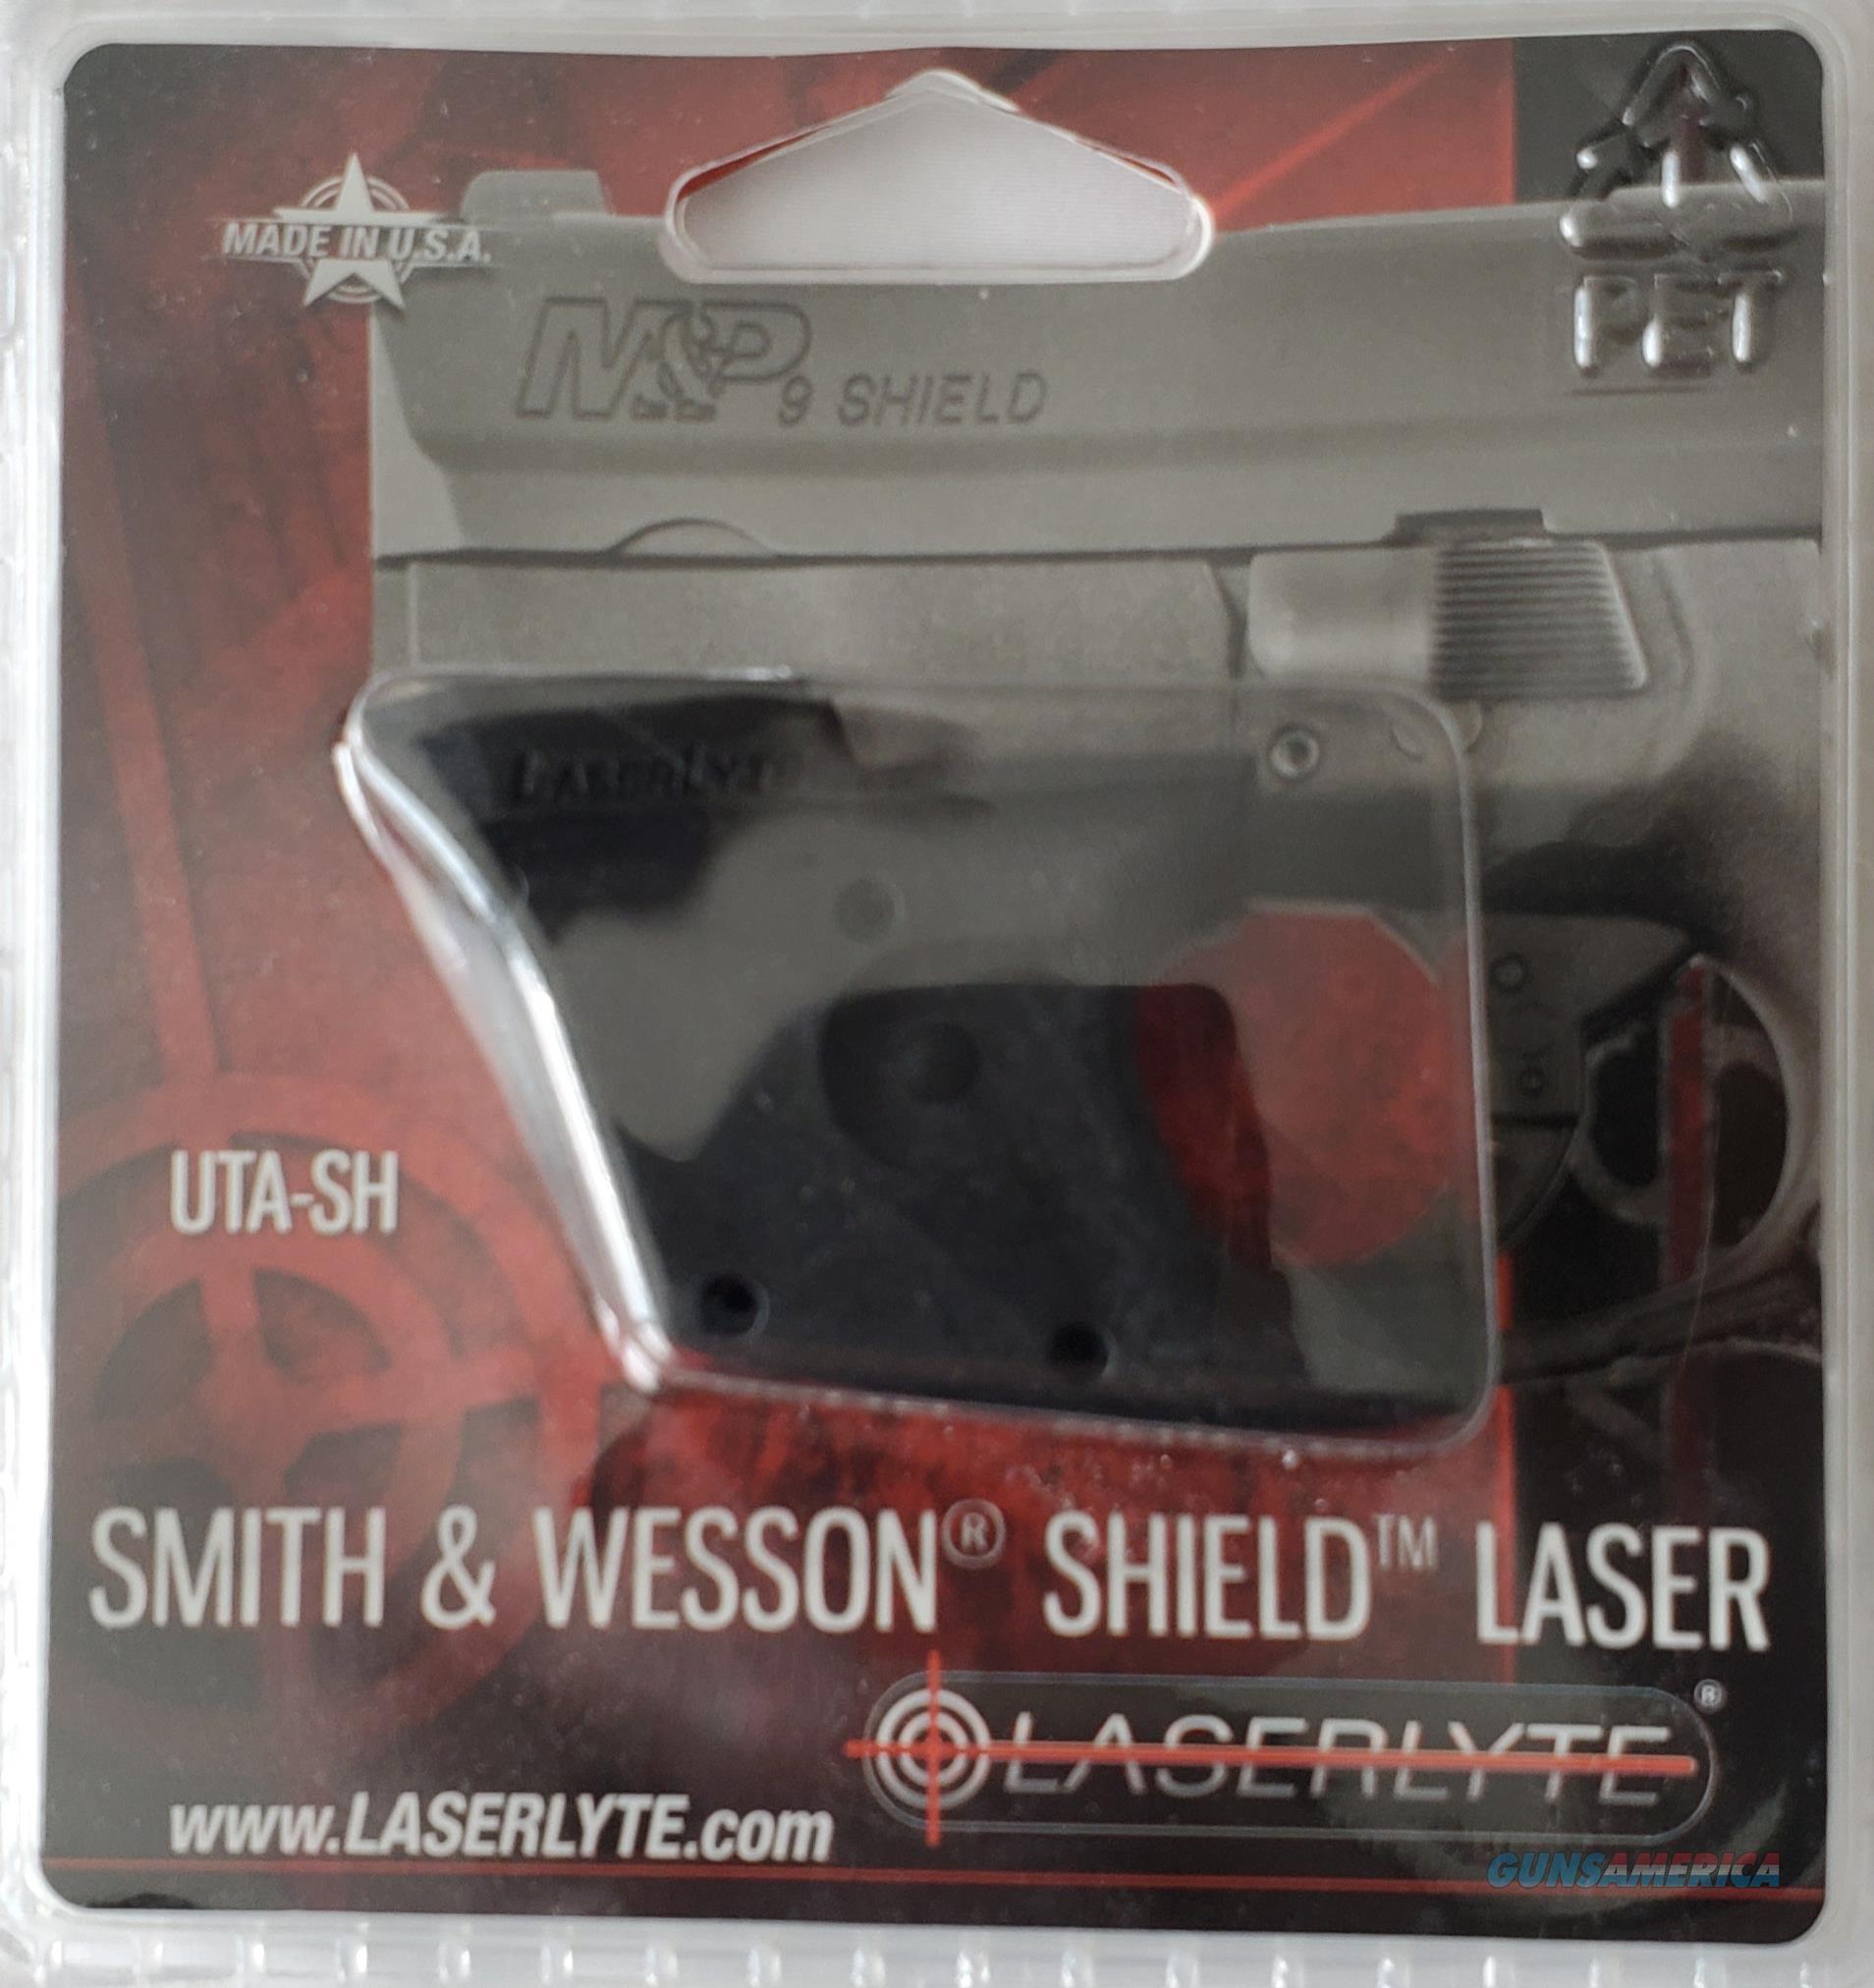 LaserLyte LASER SIGHT Smith & Wesson M&P Shield  NEW!   UTA-SH  Non-Guns > Scopes/Mounts/Rings & Optics > Non-Scope Optics > Other